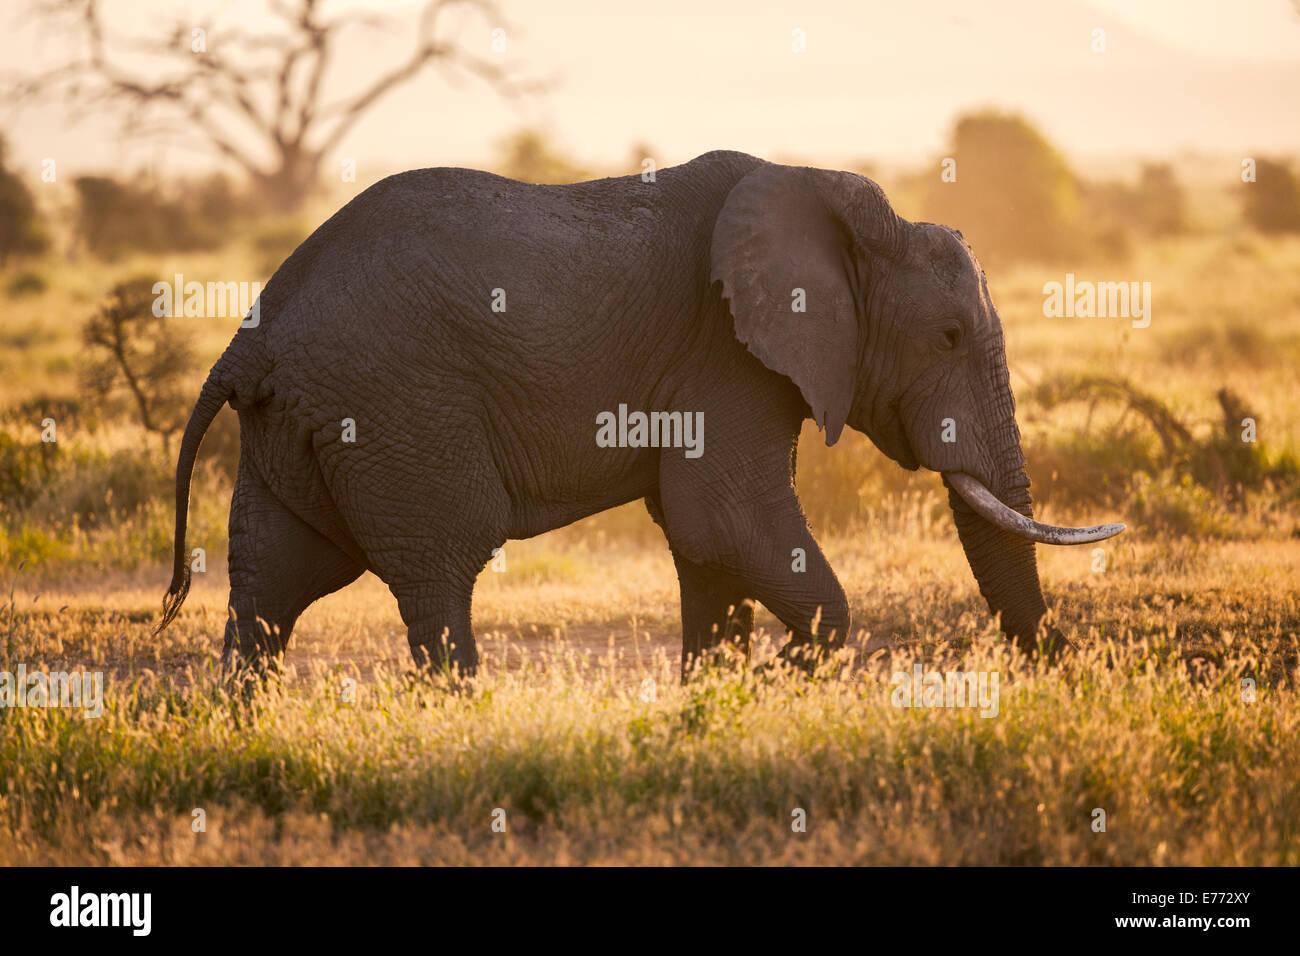 African Elephant in Backlight Amboseli National Park - Stock Image